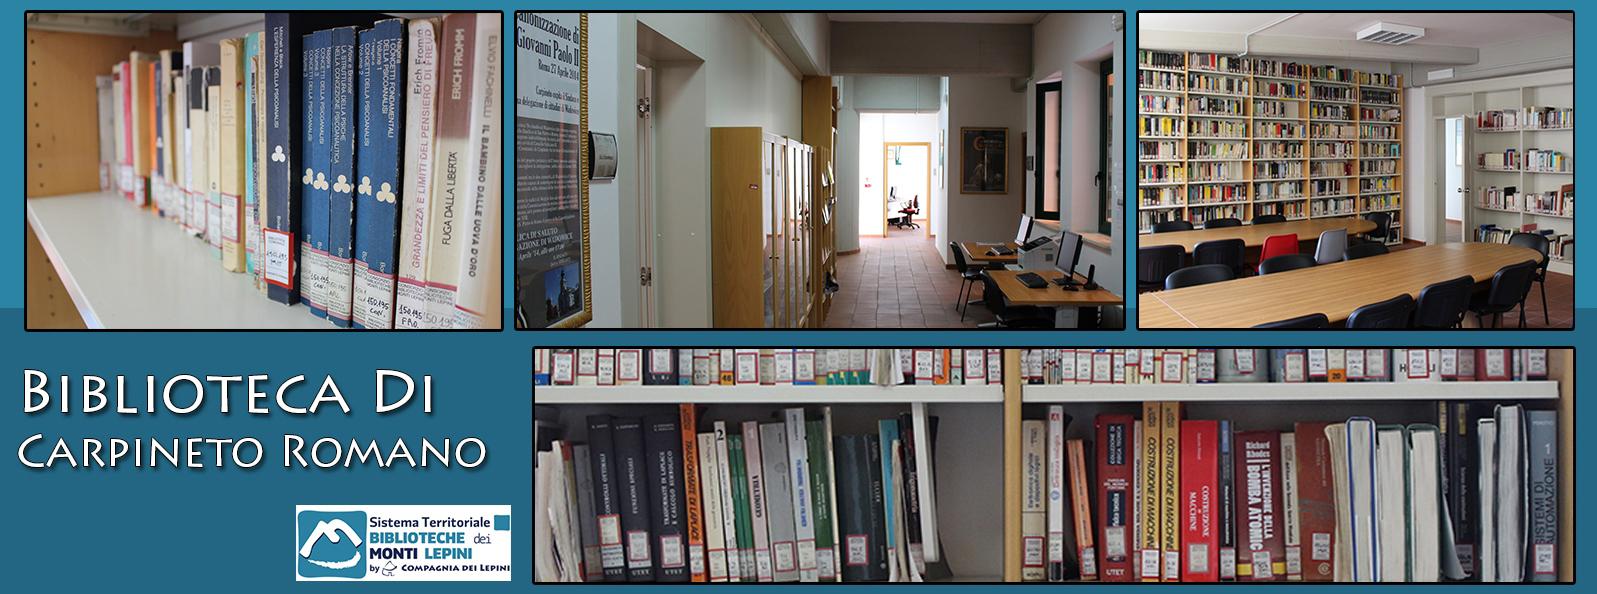 Carpineto Romano - Biblioteca Comunale